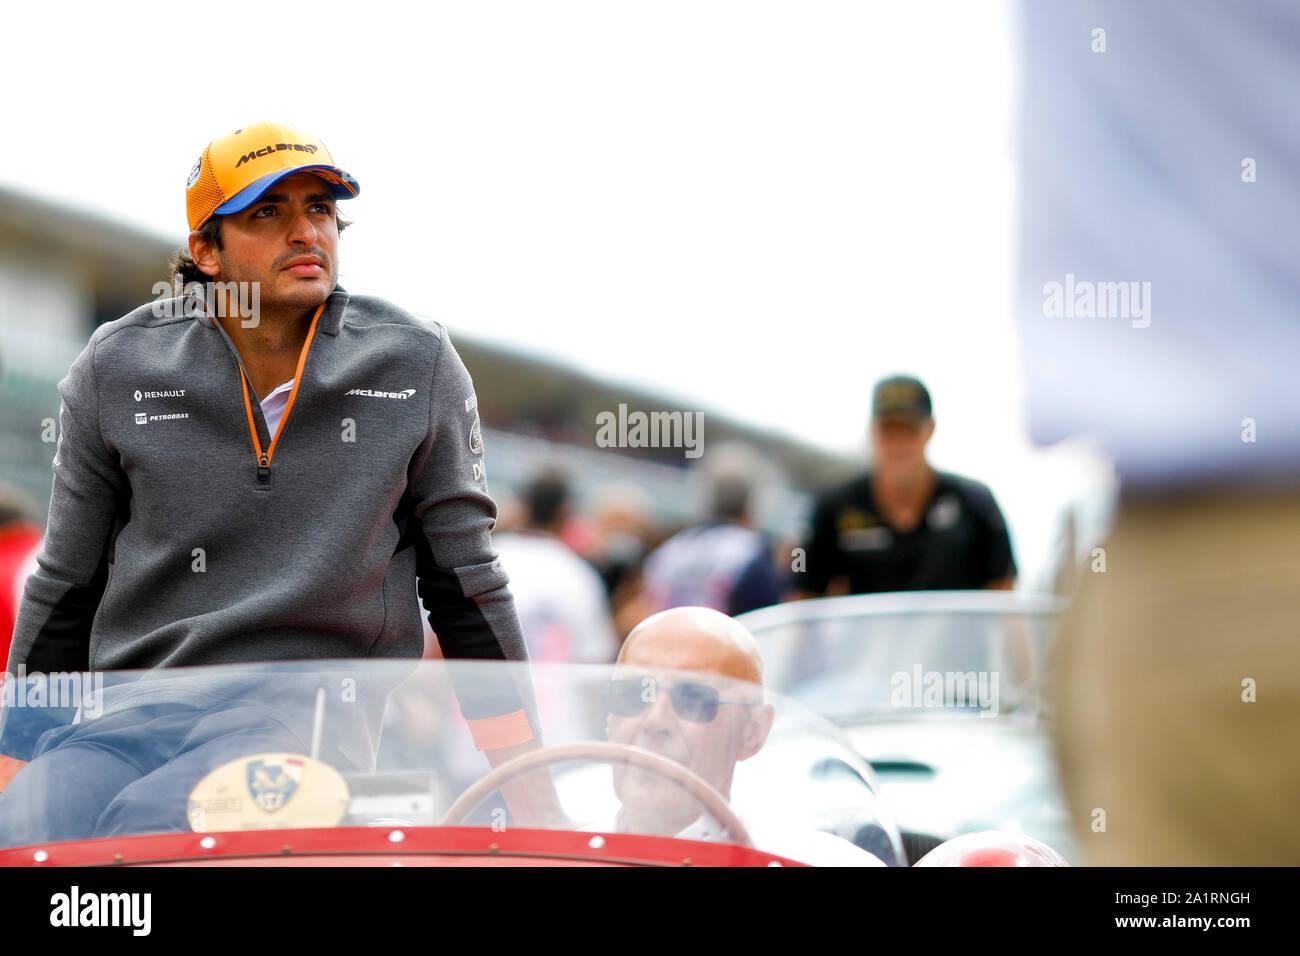 CARLOS SAINZ Jr of McLaren F1 Team at the Formula 1 Italian Grand Prix at Monza Eni Circuit in Monza, Italy. Stock Photo